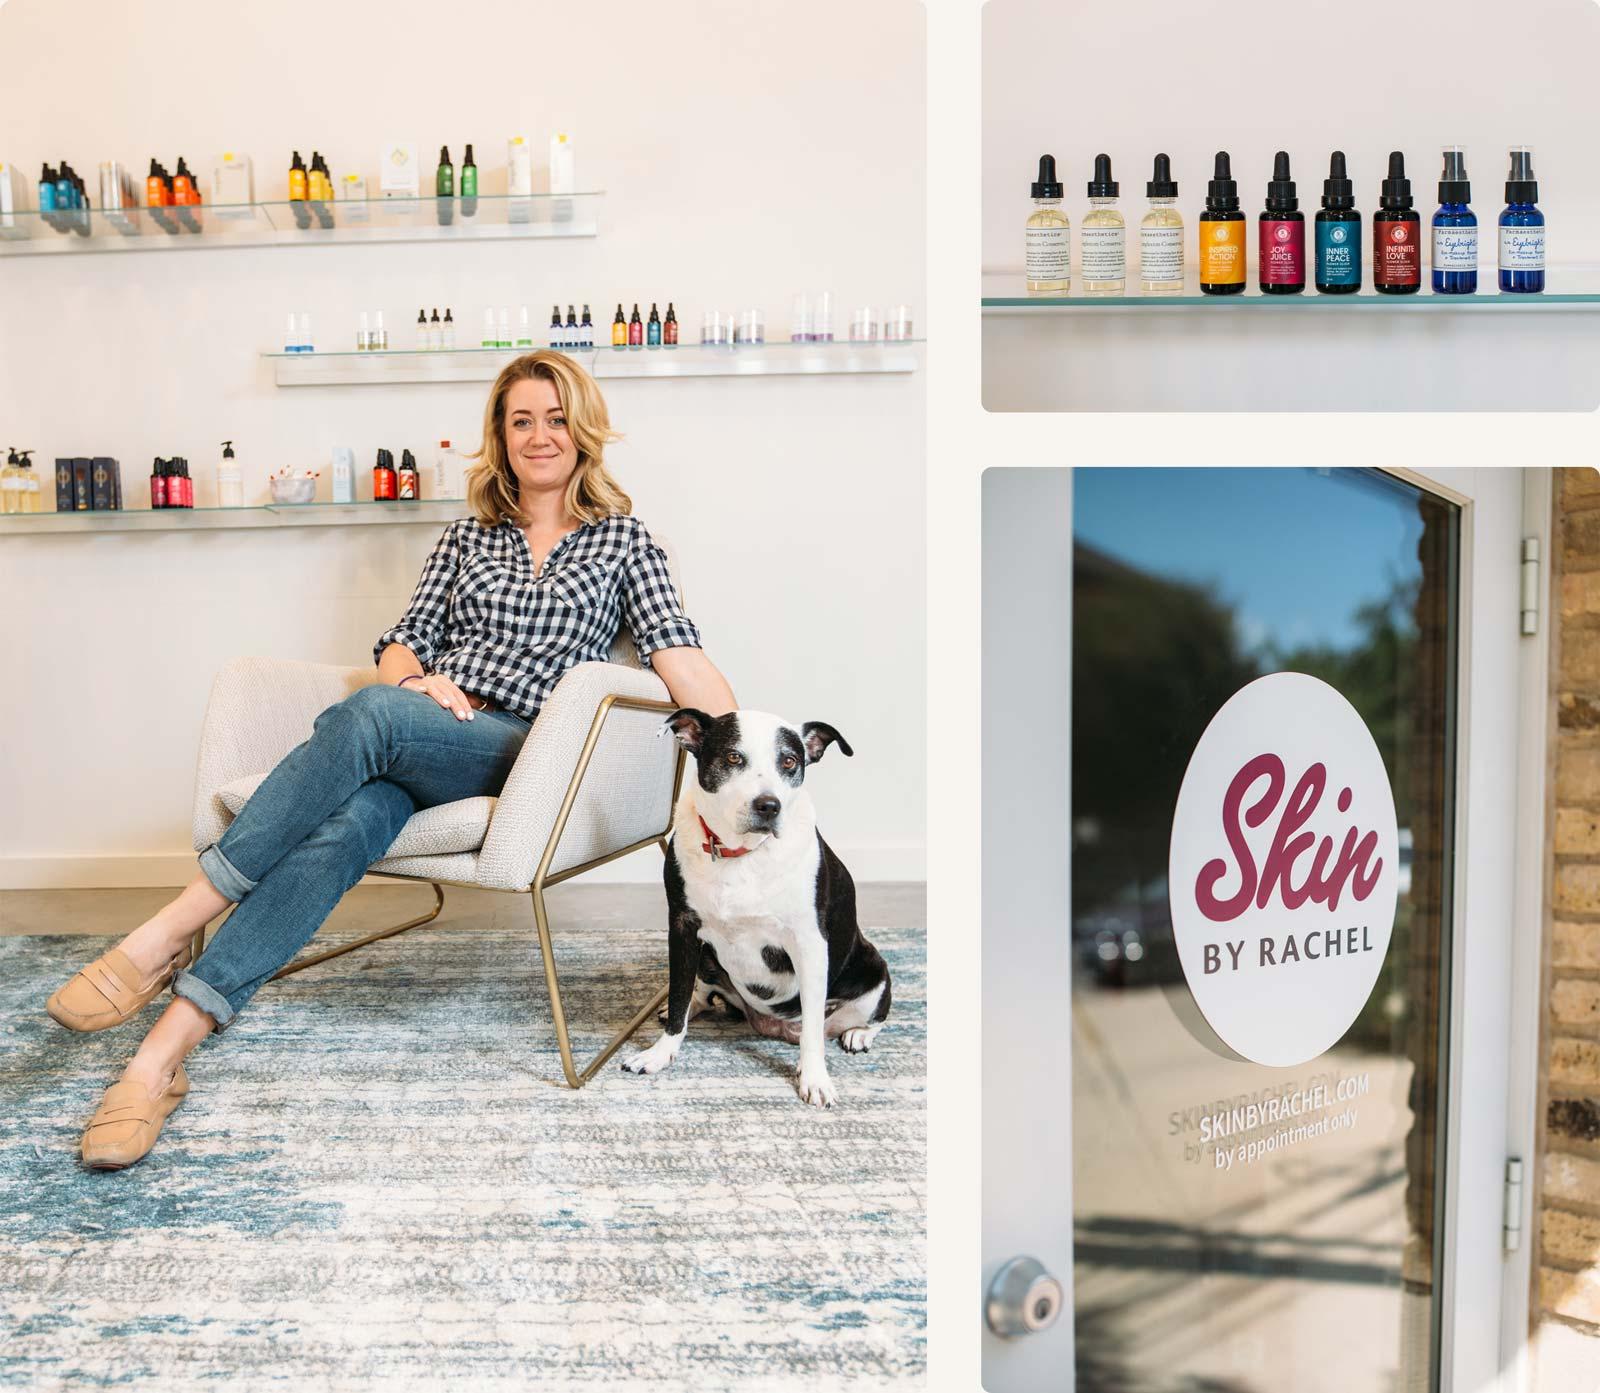 Rachel Spillman of skin by Rachel posing with her dog in the interior of skin by Rachel